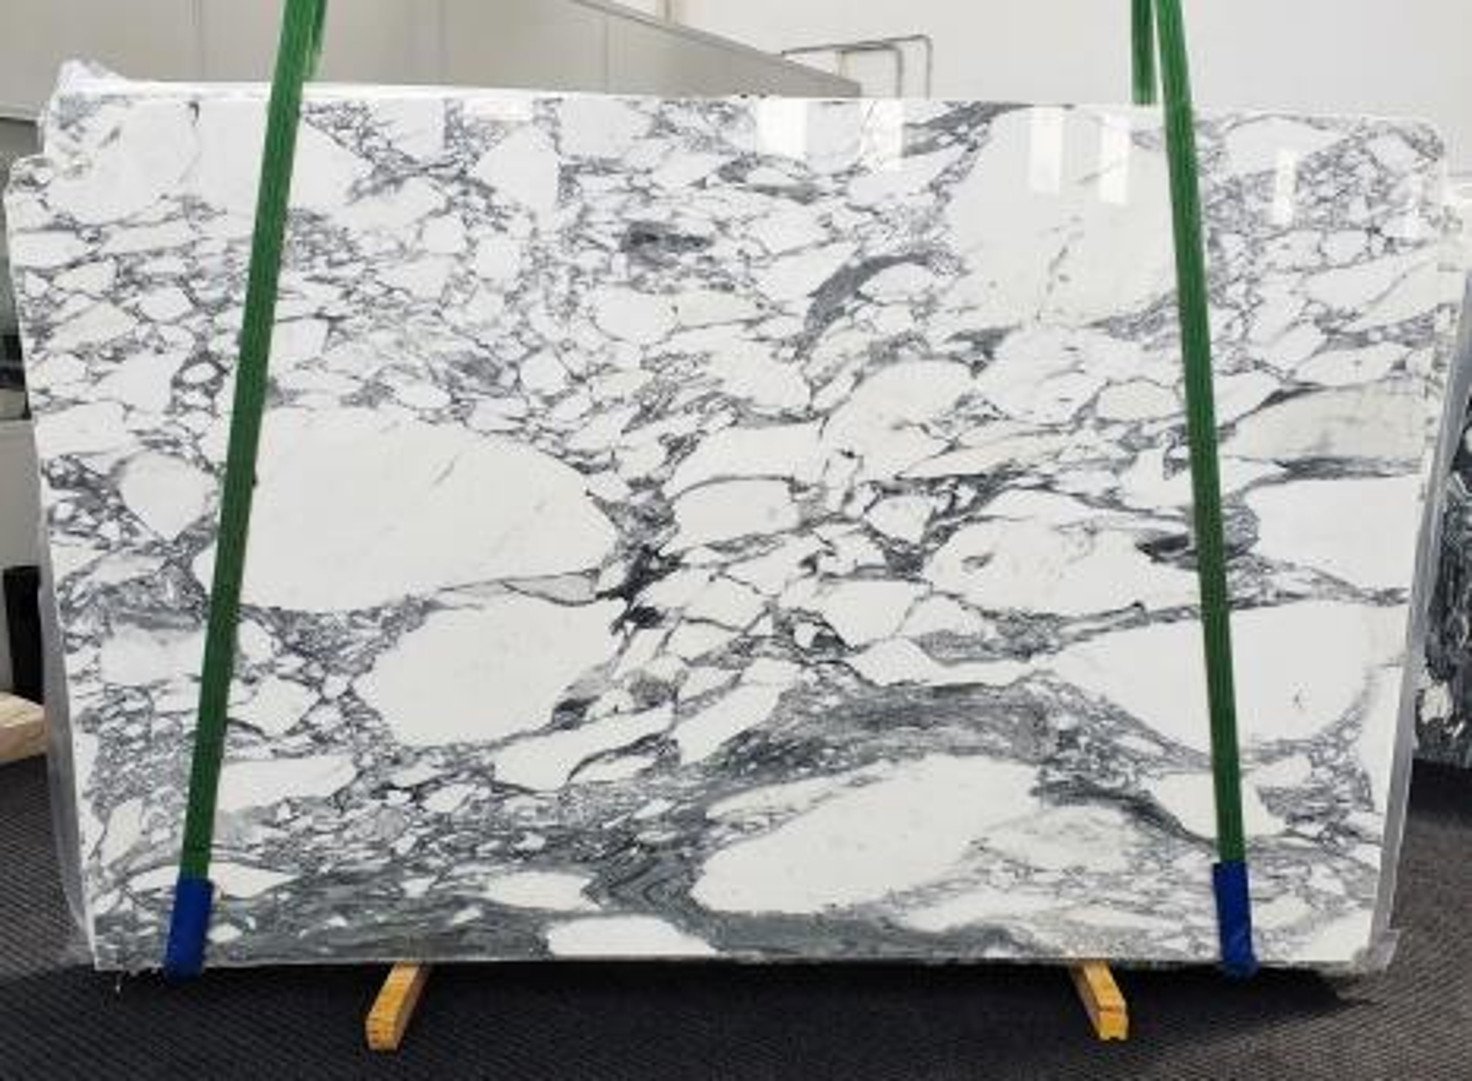 ARABESCATO CORCHIA polierte Unmaßplatten 1433 aus Natur Marmor , Slab #45: Lieferung Veneto, Italien